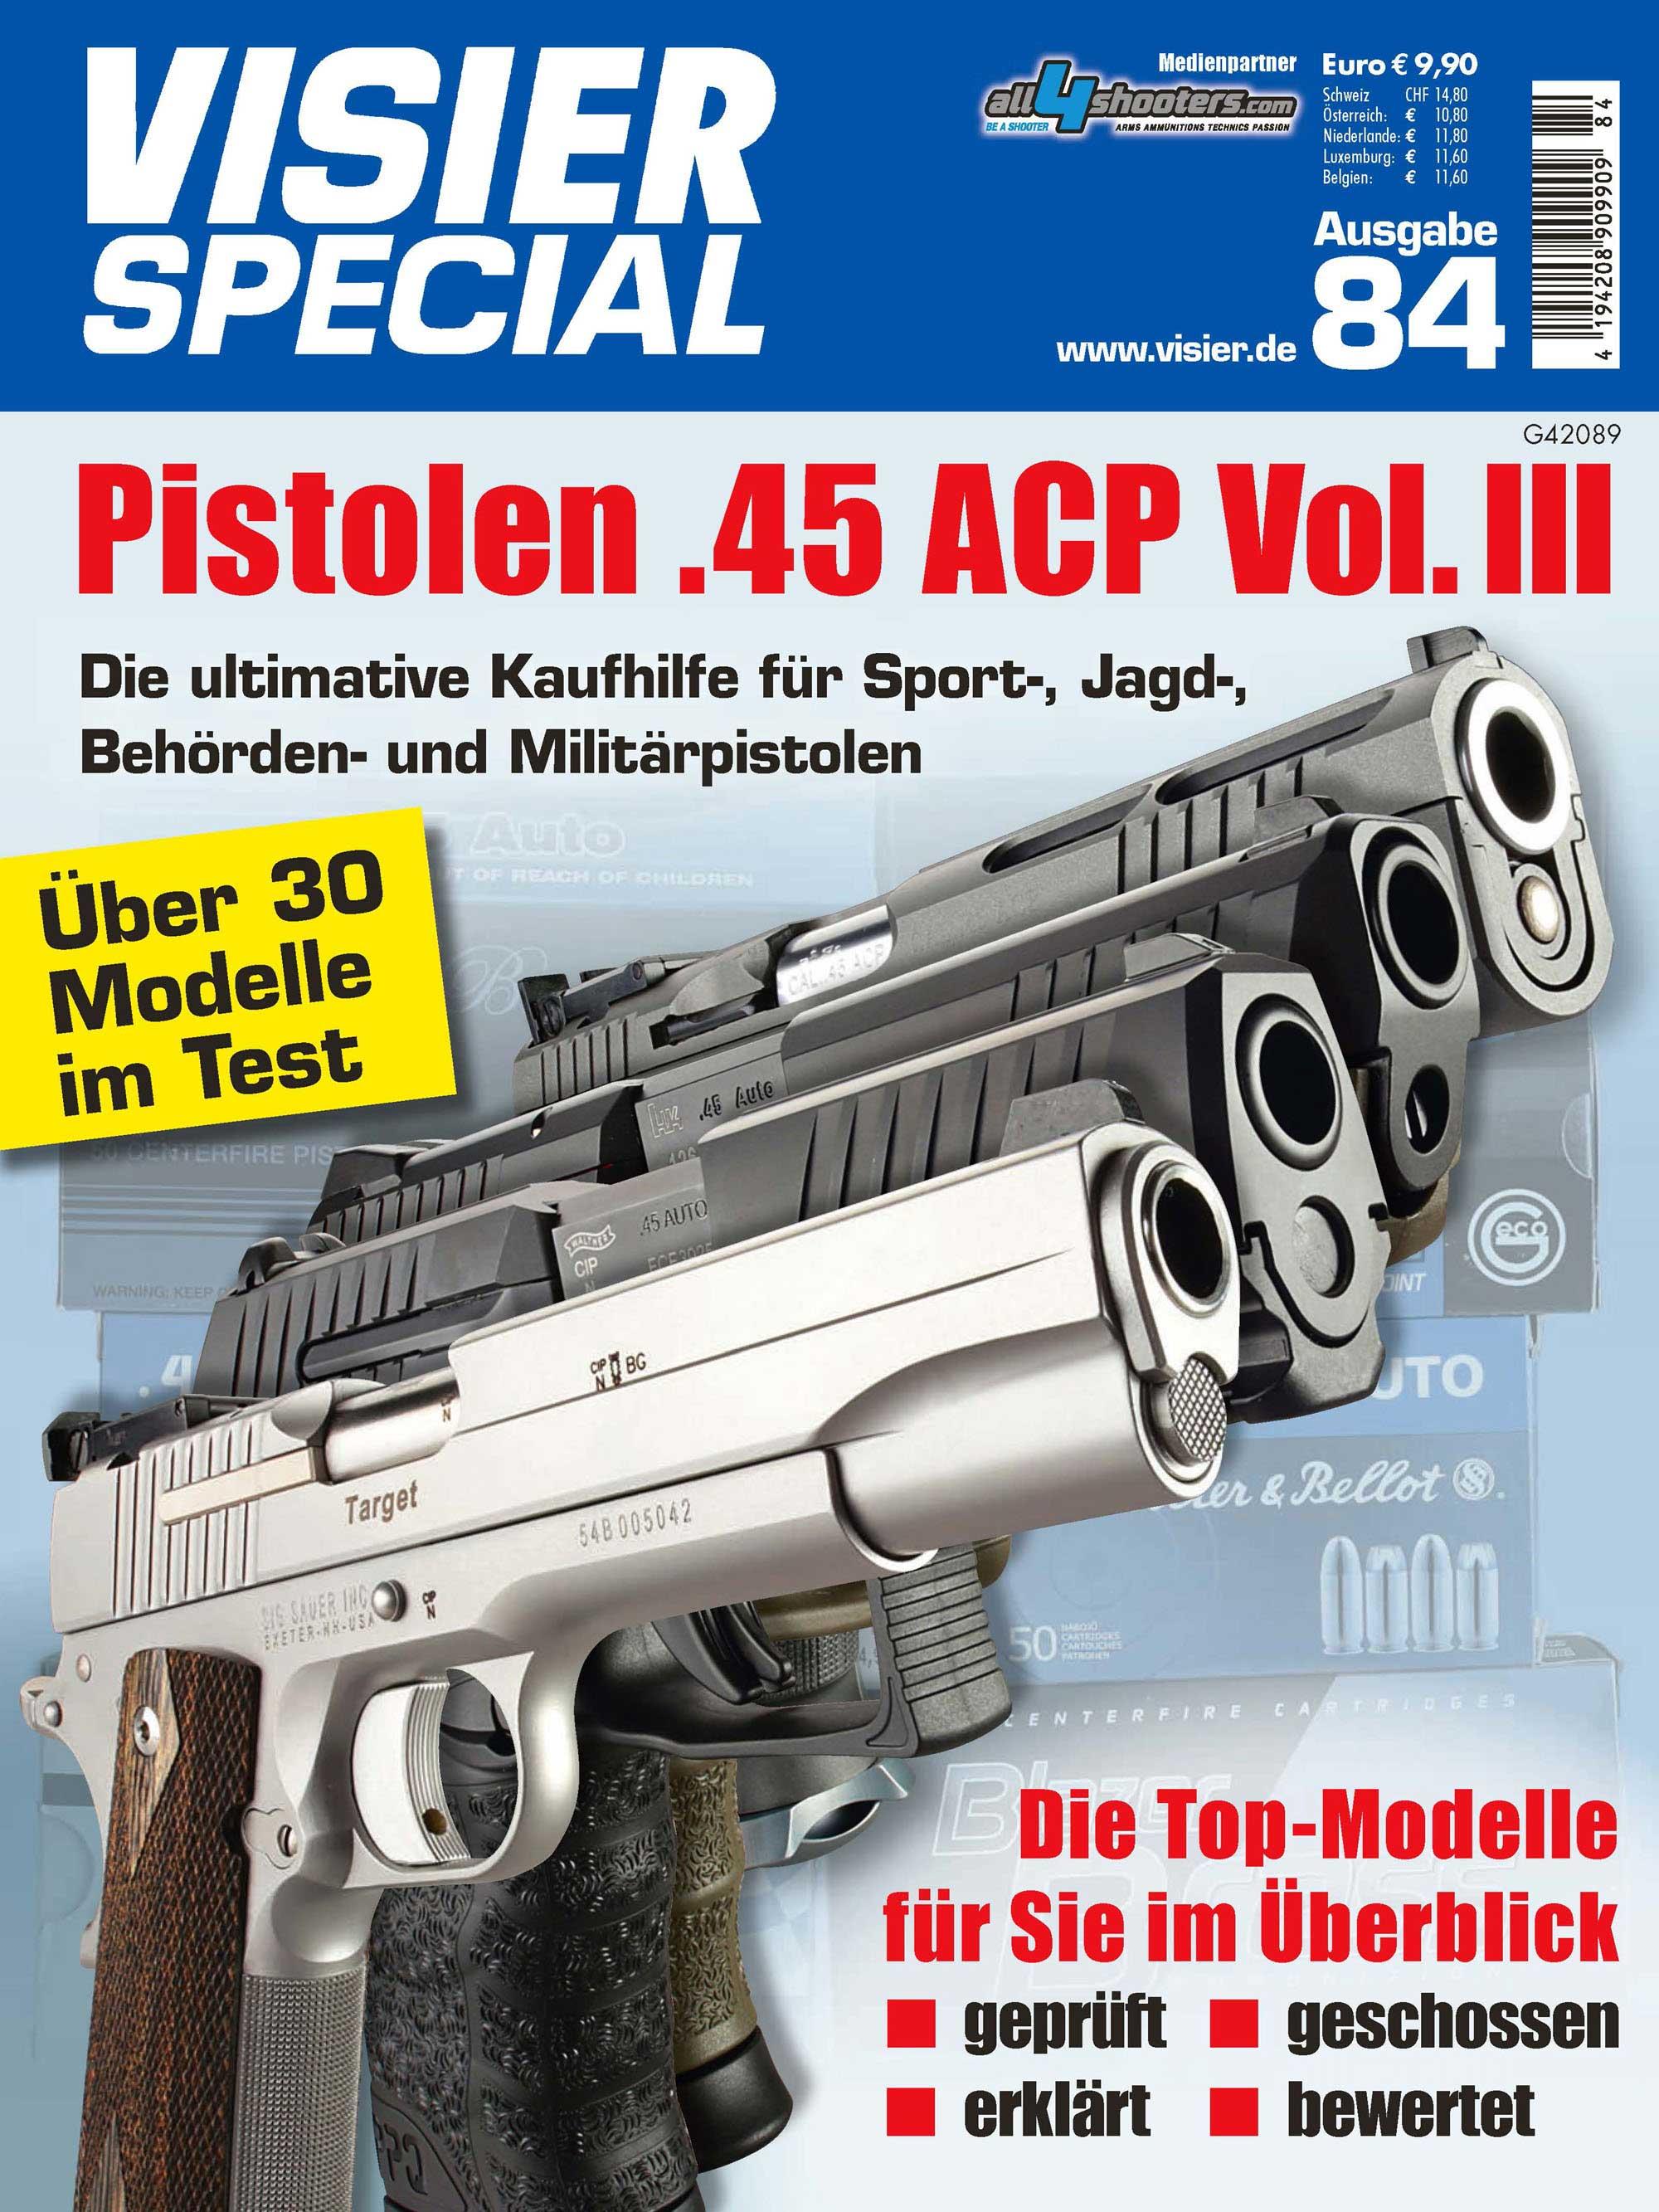 VISIER-Special 84